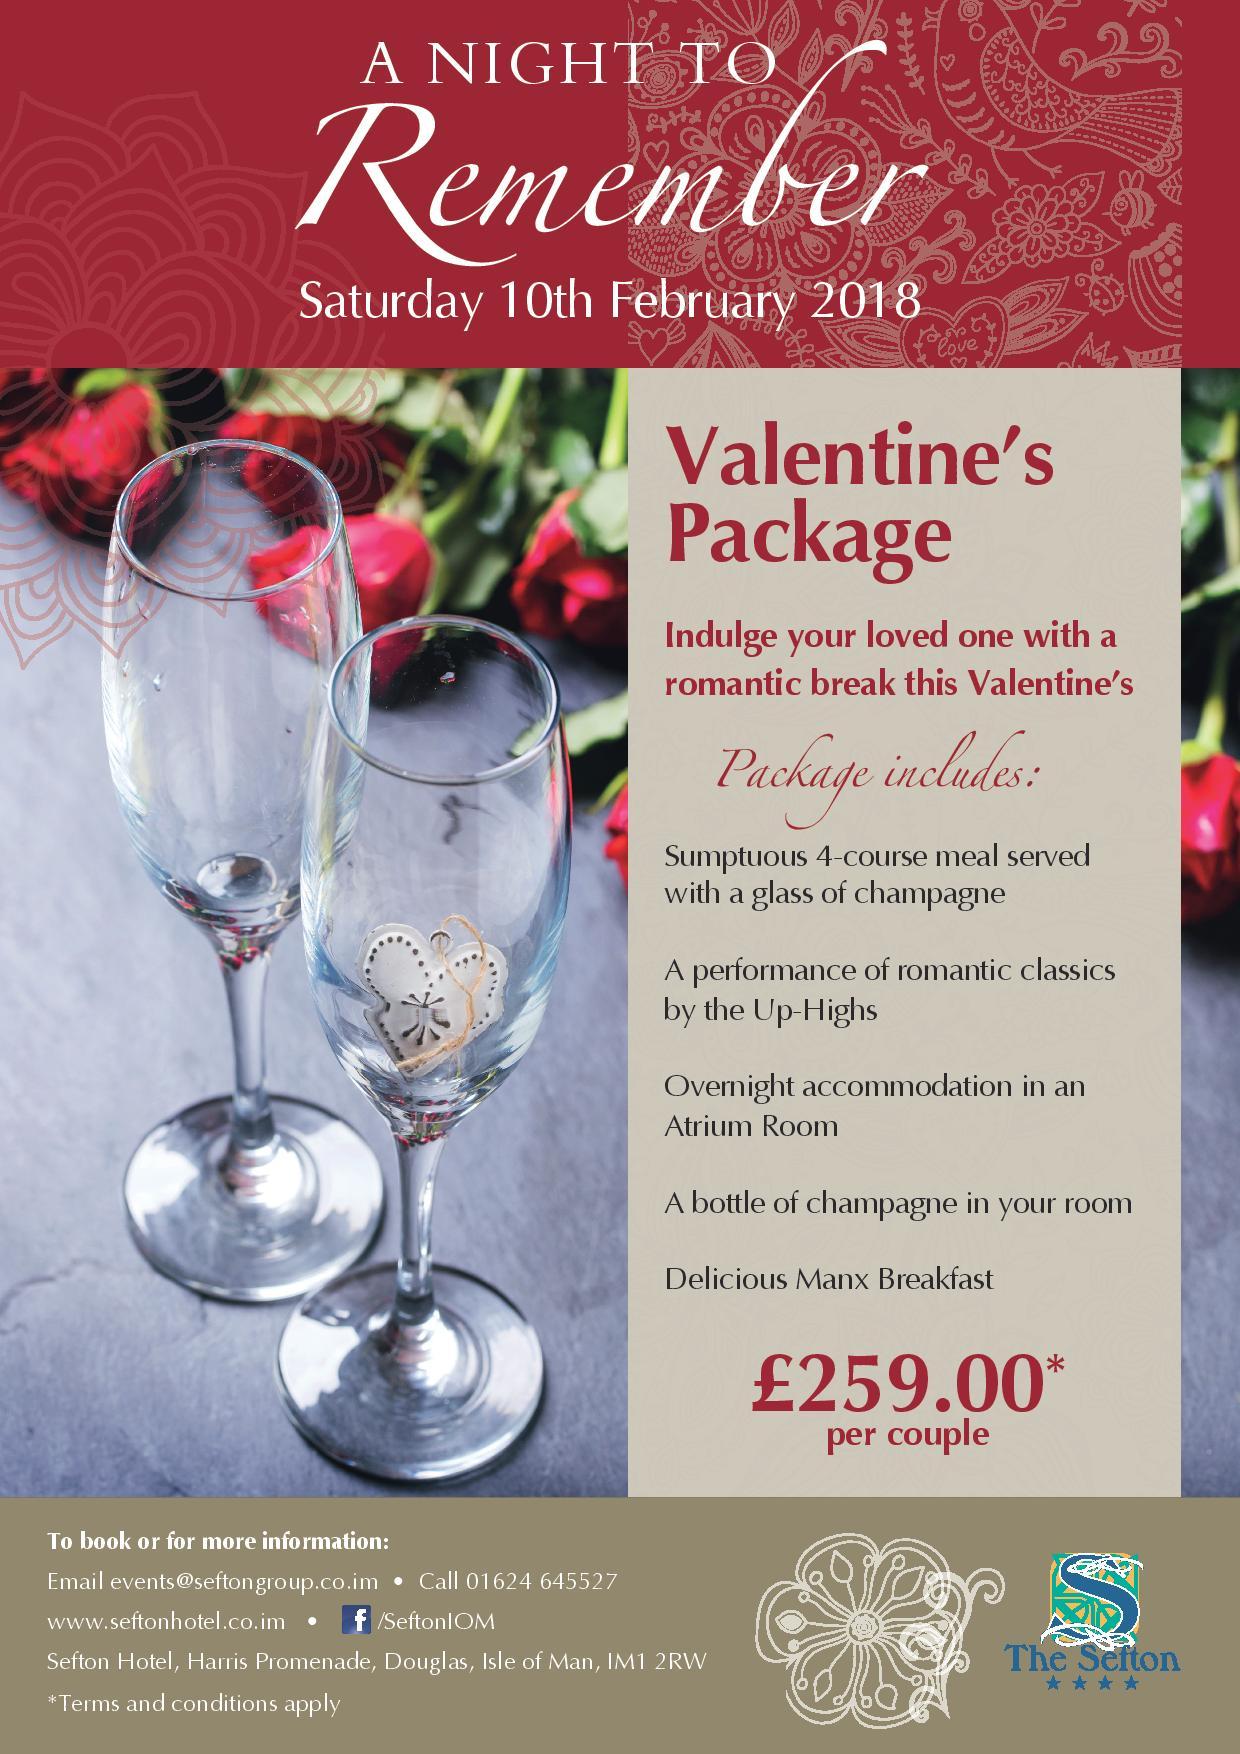 Valentine's at The Sefton